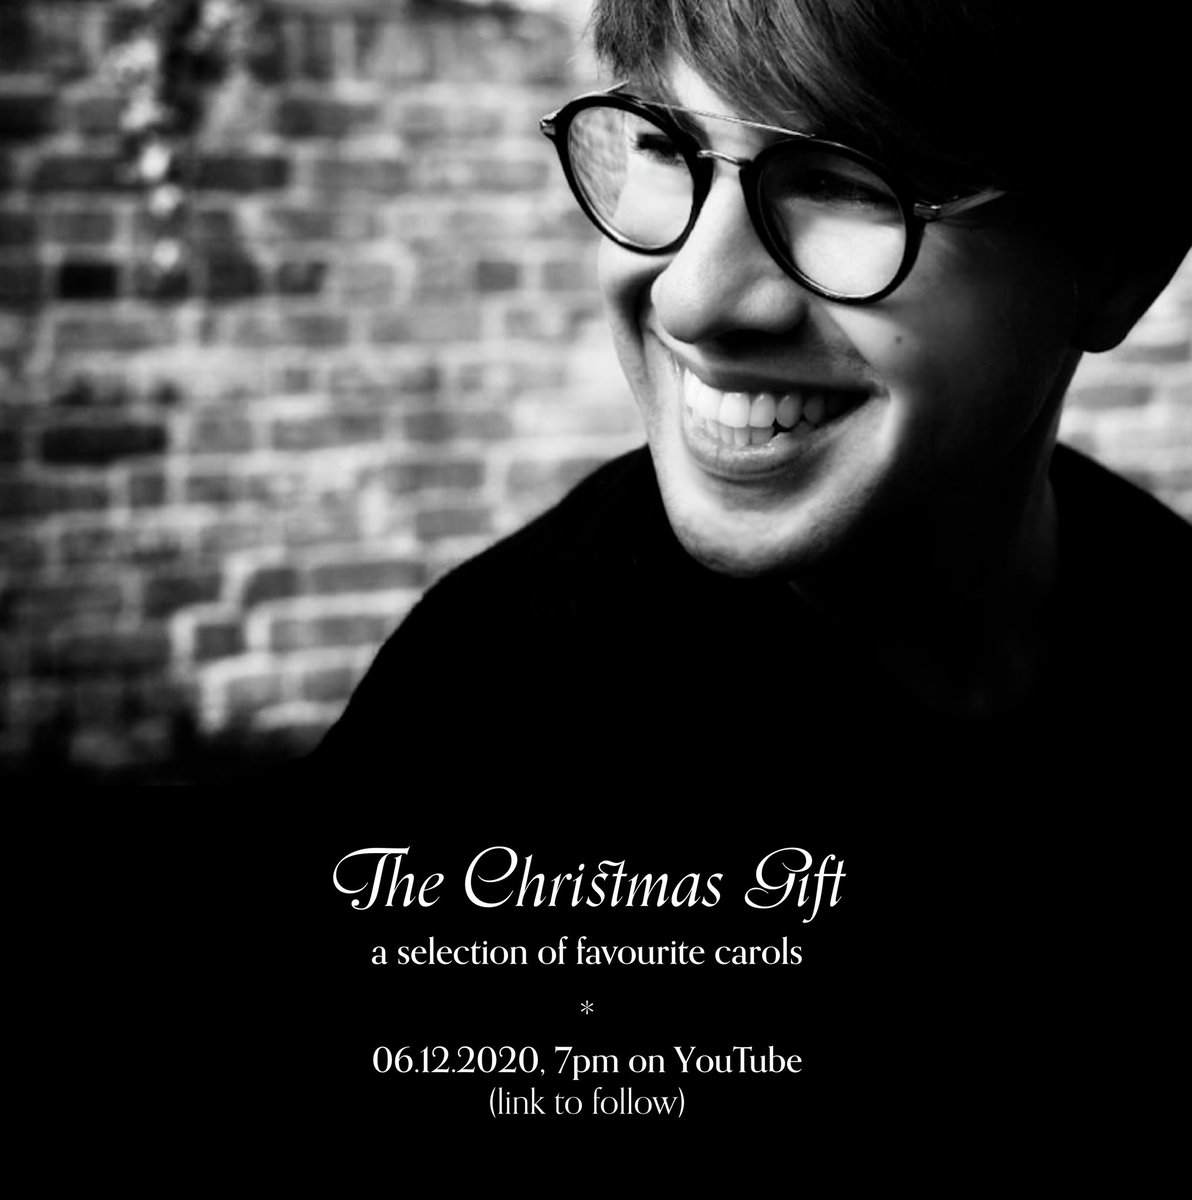 The Christmas Gift - 06.12.2020 - 7pm on YouTube (link to follow) in aid of @GwentArtsHealth with thanks @milliedaviesss @Rachael02Davies @LouiseRyanVS @tomauton @CarysMatt @StrokeHubWales @cardiffmet @eleanorthp @celynlewis_ & the divas....🌈💙 #Christmas2020 #carols #love https://t.co/CkSUND9lIq https://t.co/LZ0JPaoAKW